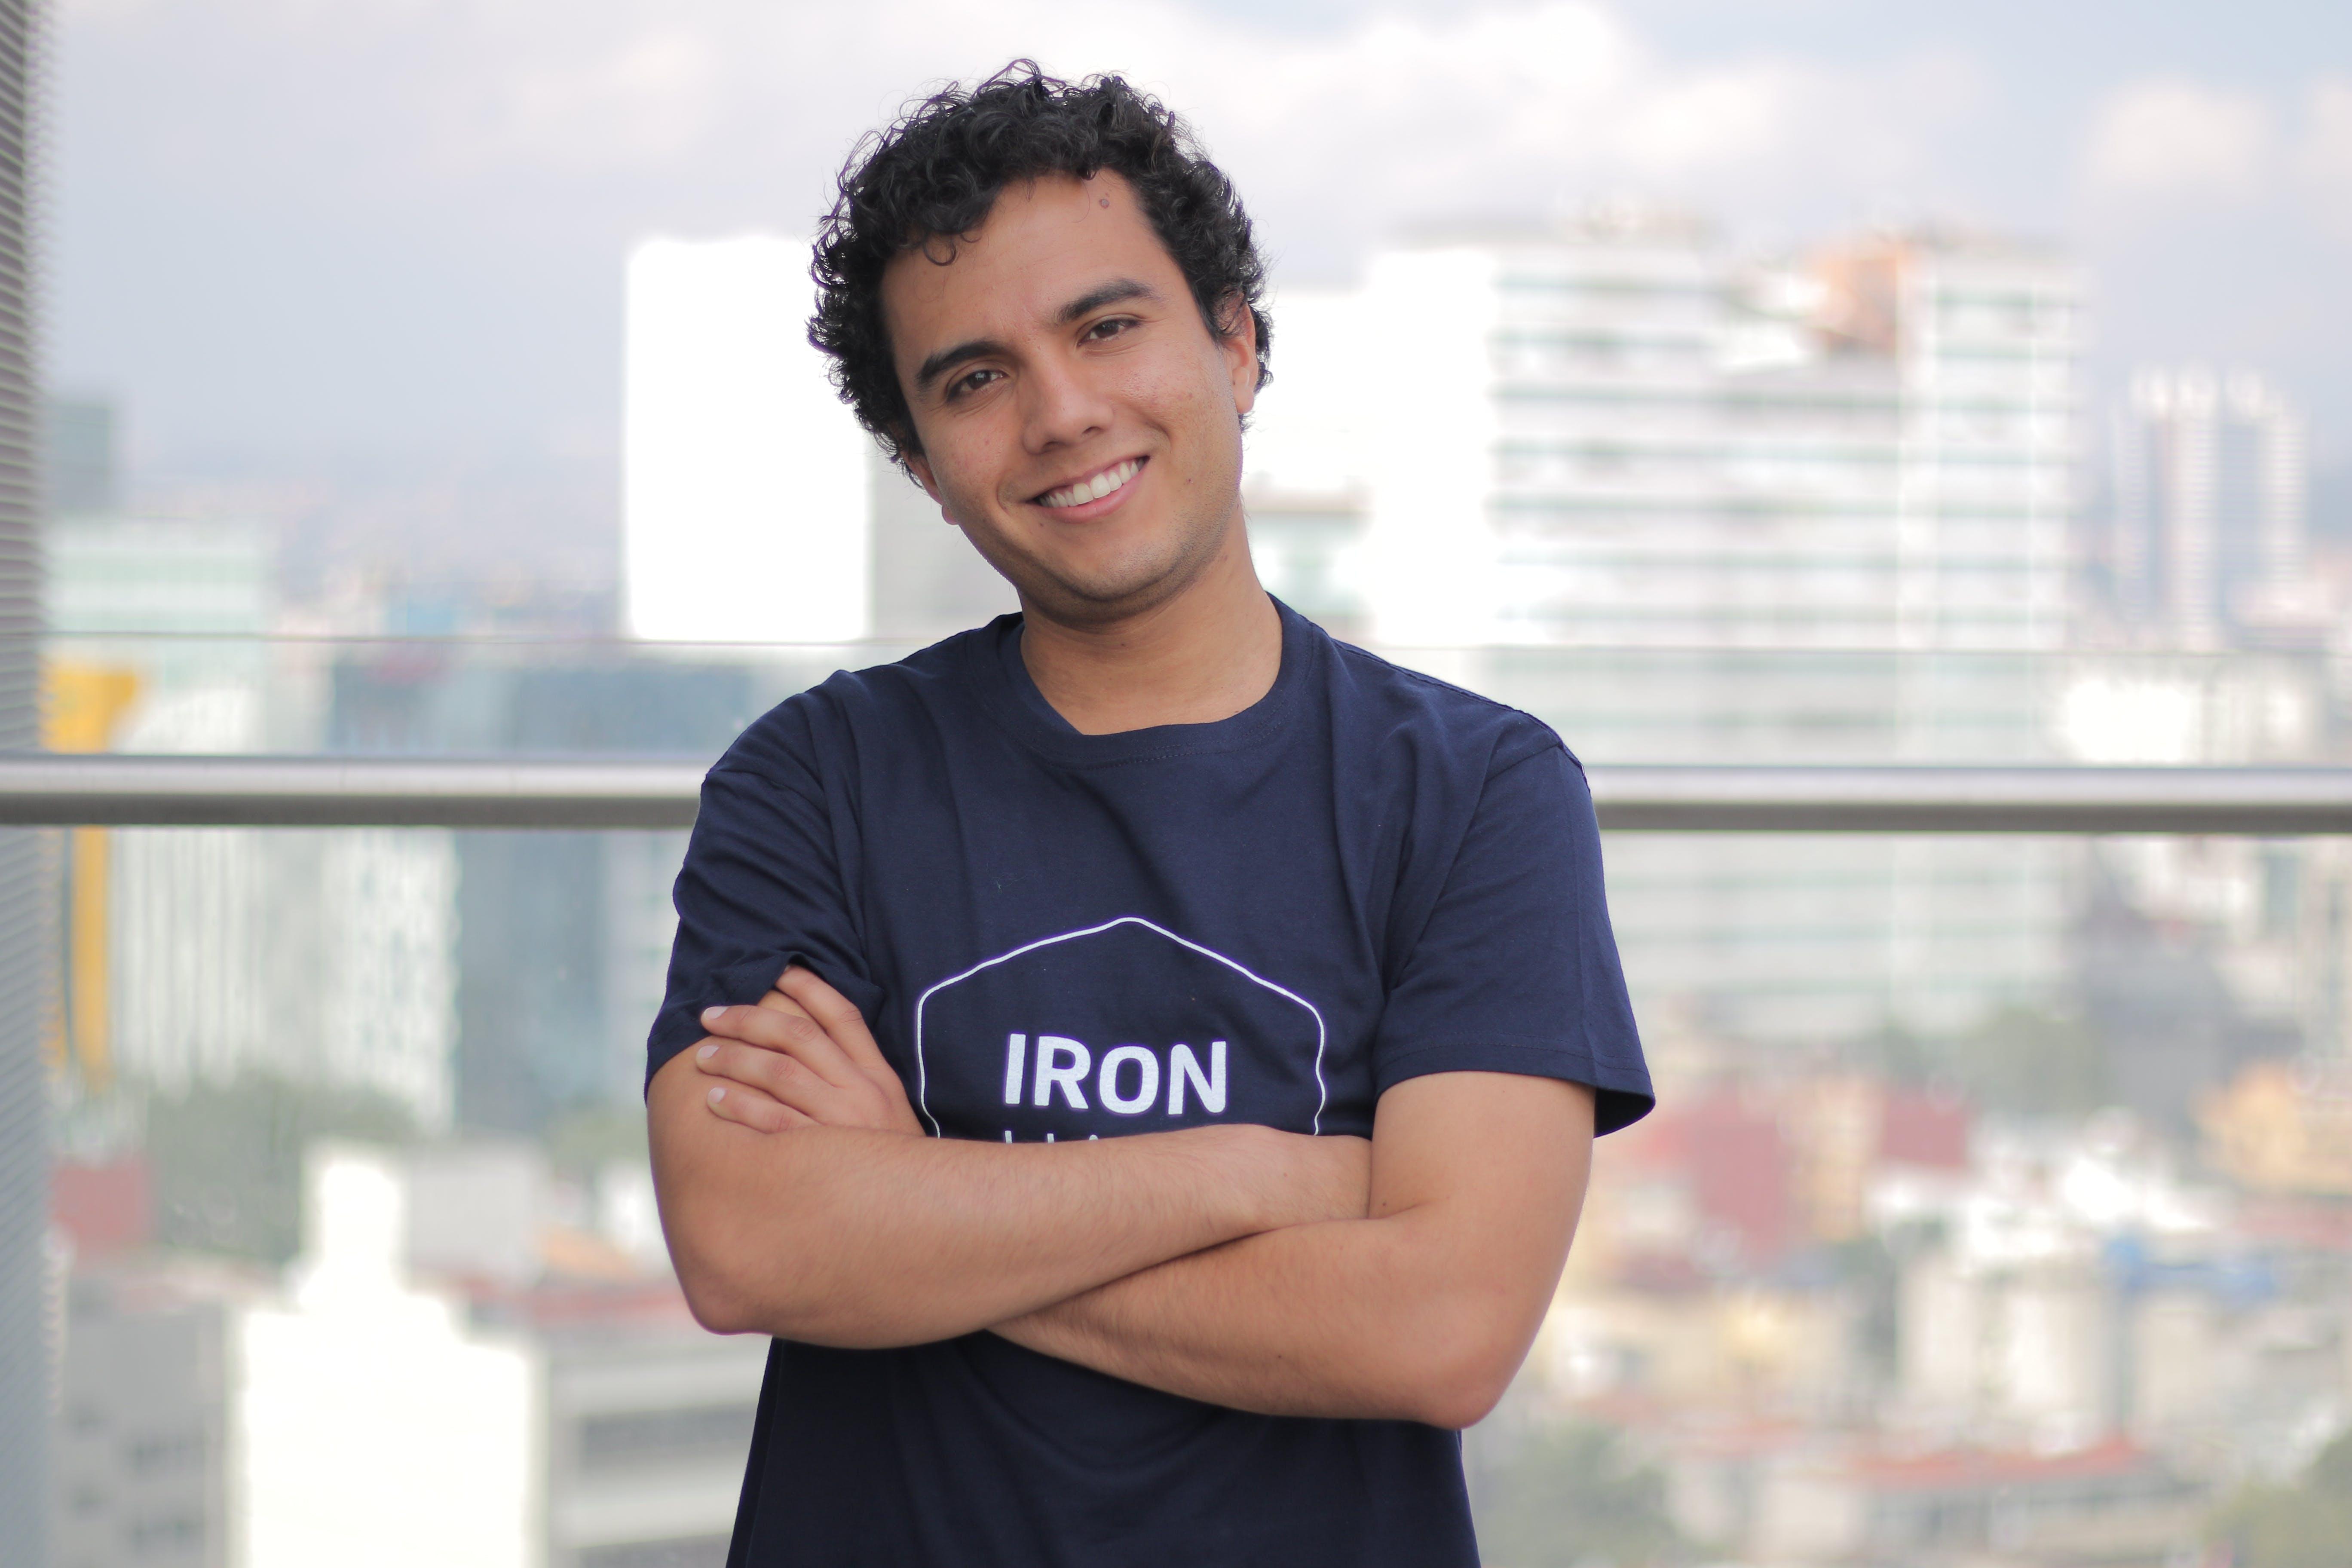 Ironhack Web development instructor Dylan Torres